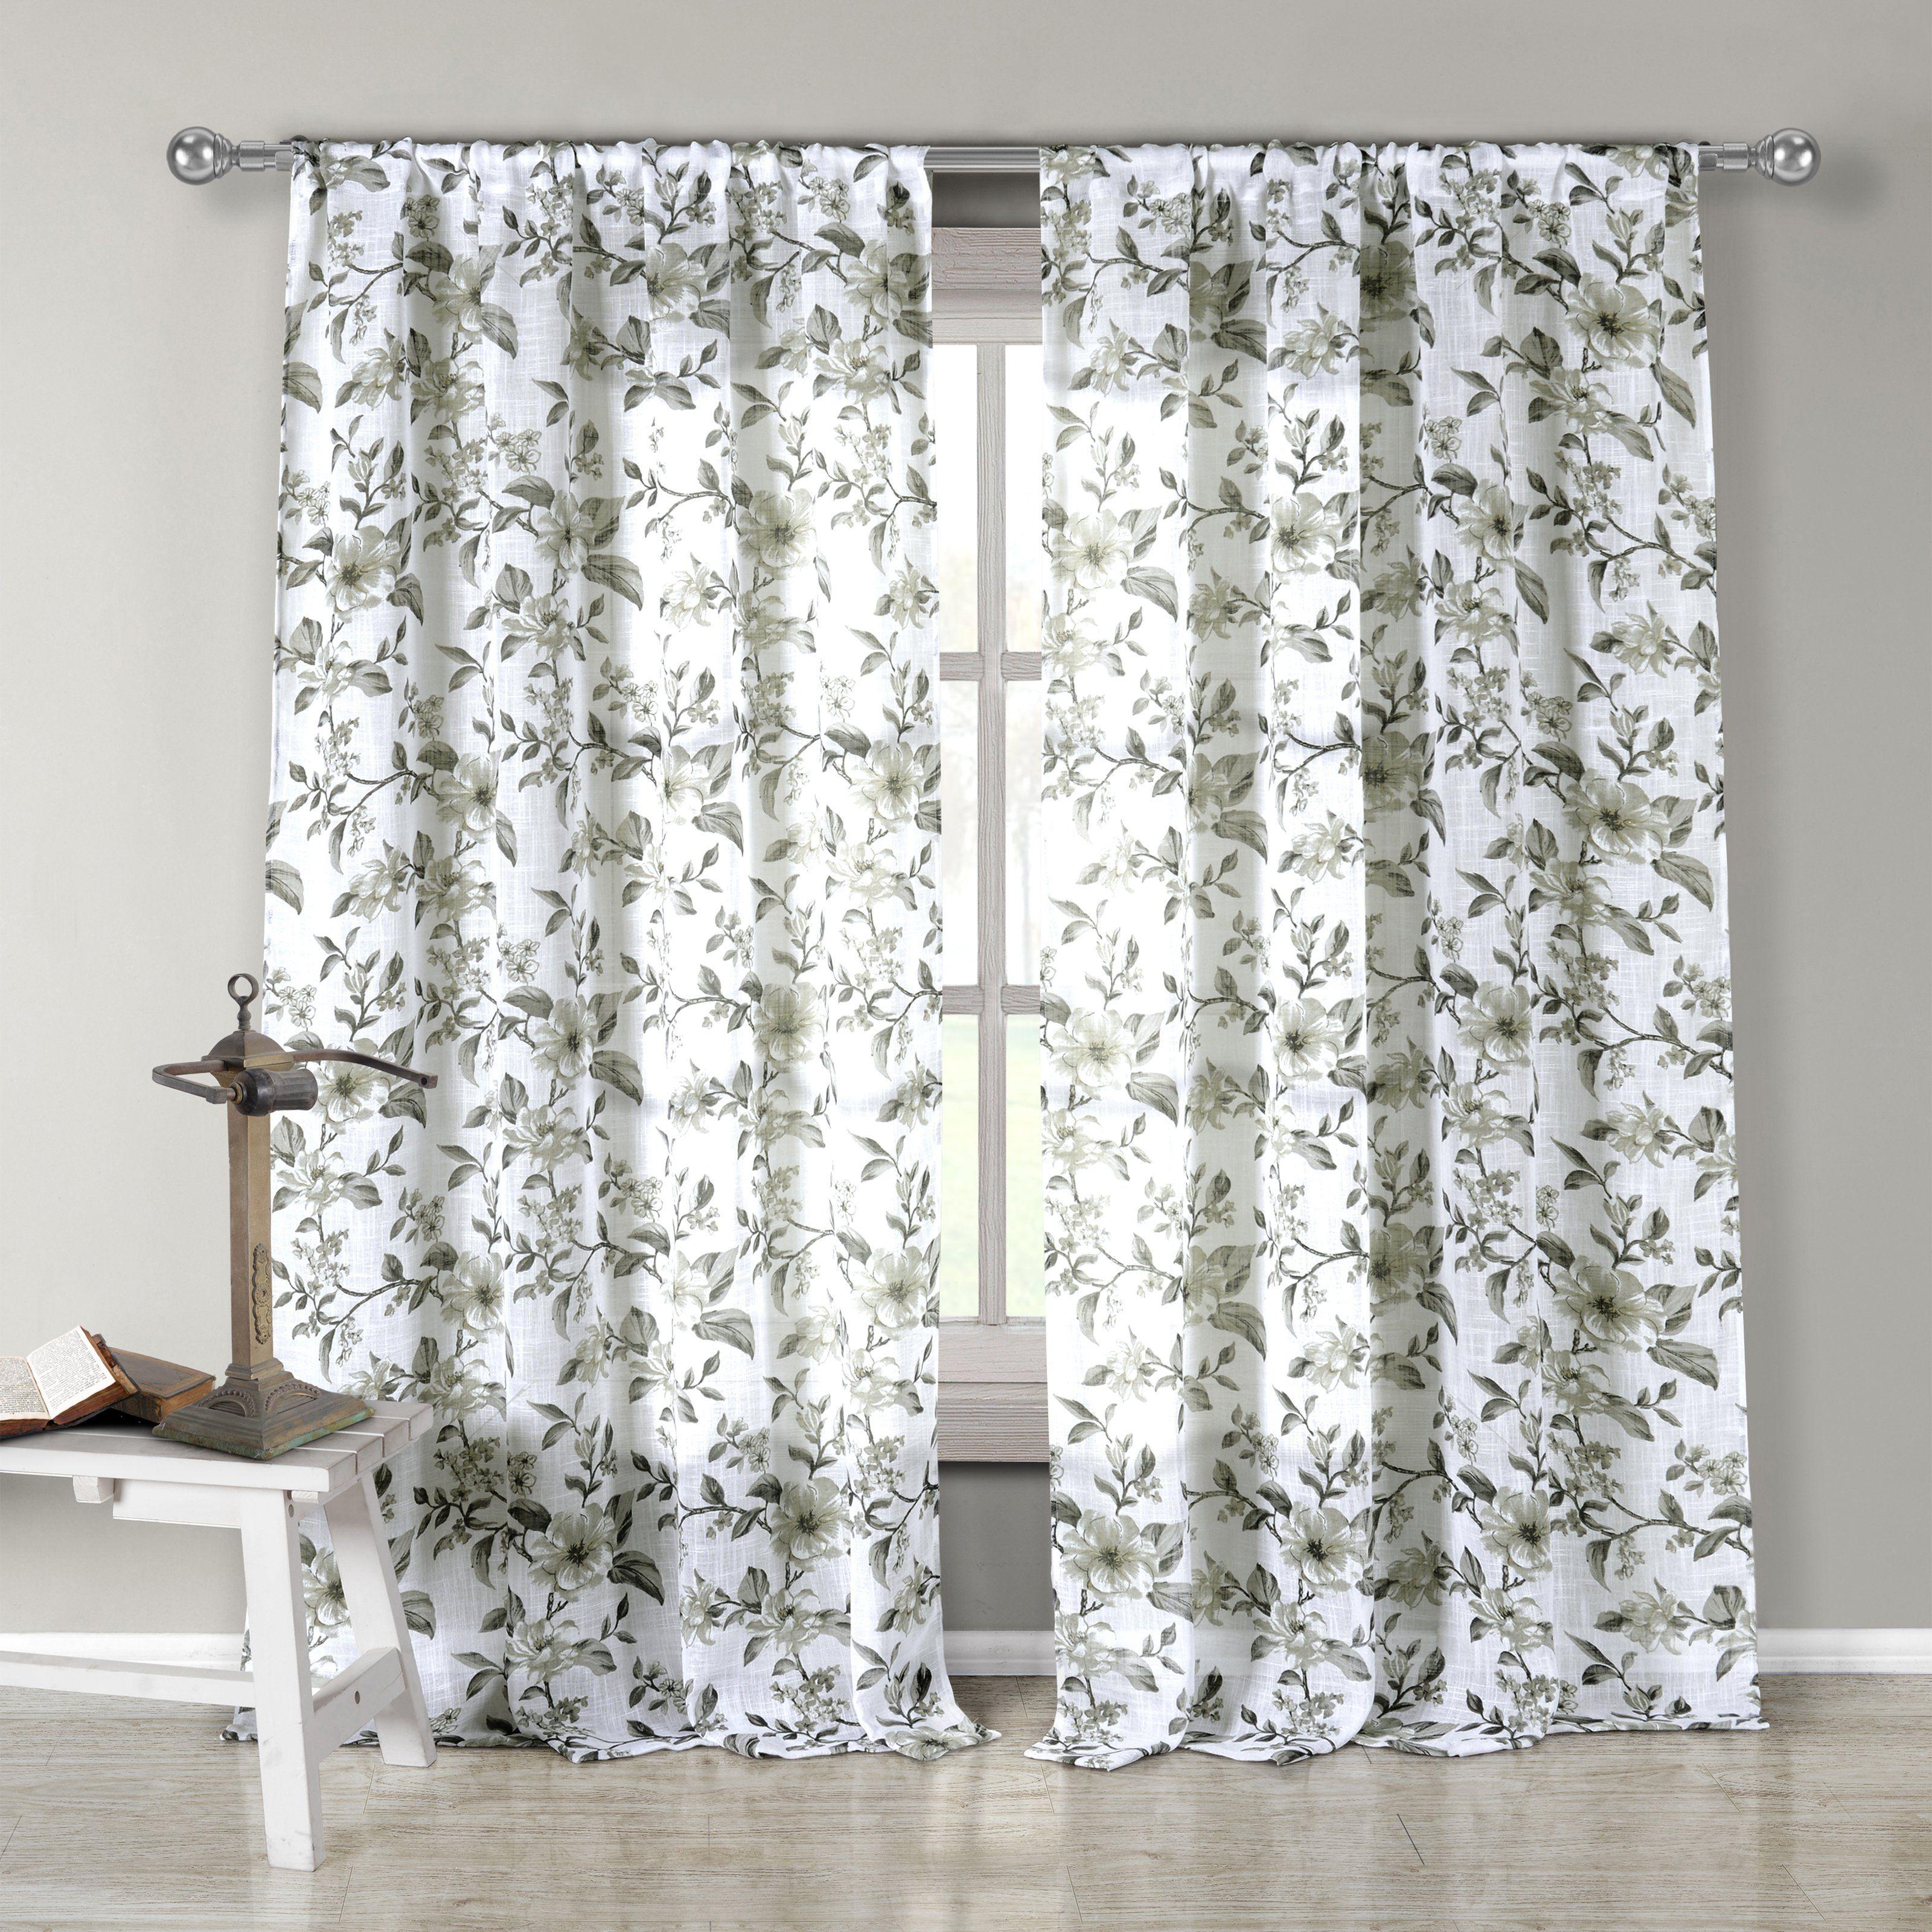 Duck River Lylia Pole Top Curtain Panel  Lypgo=12 3896